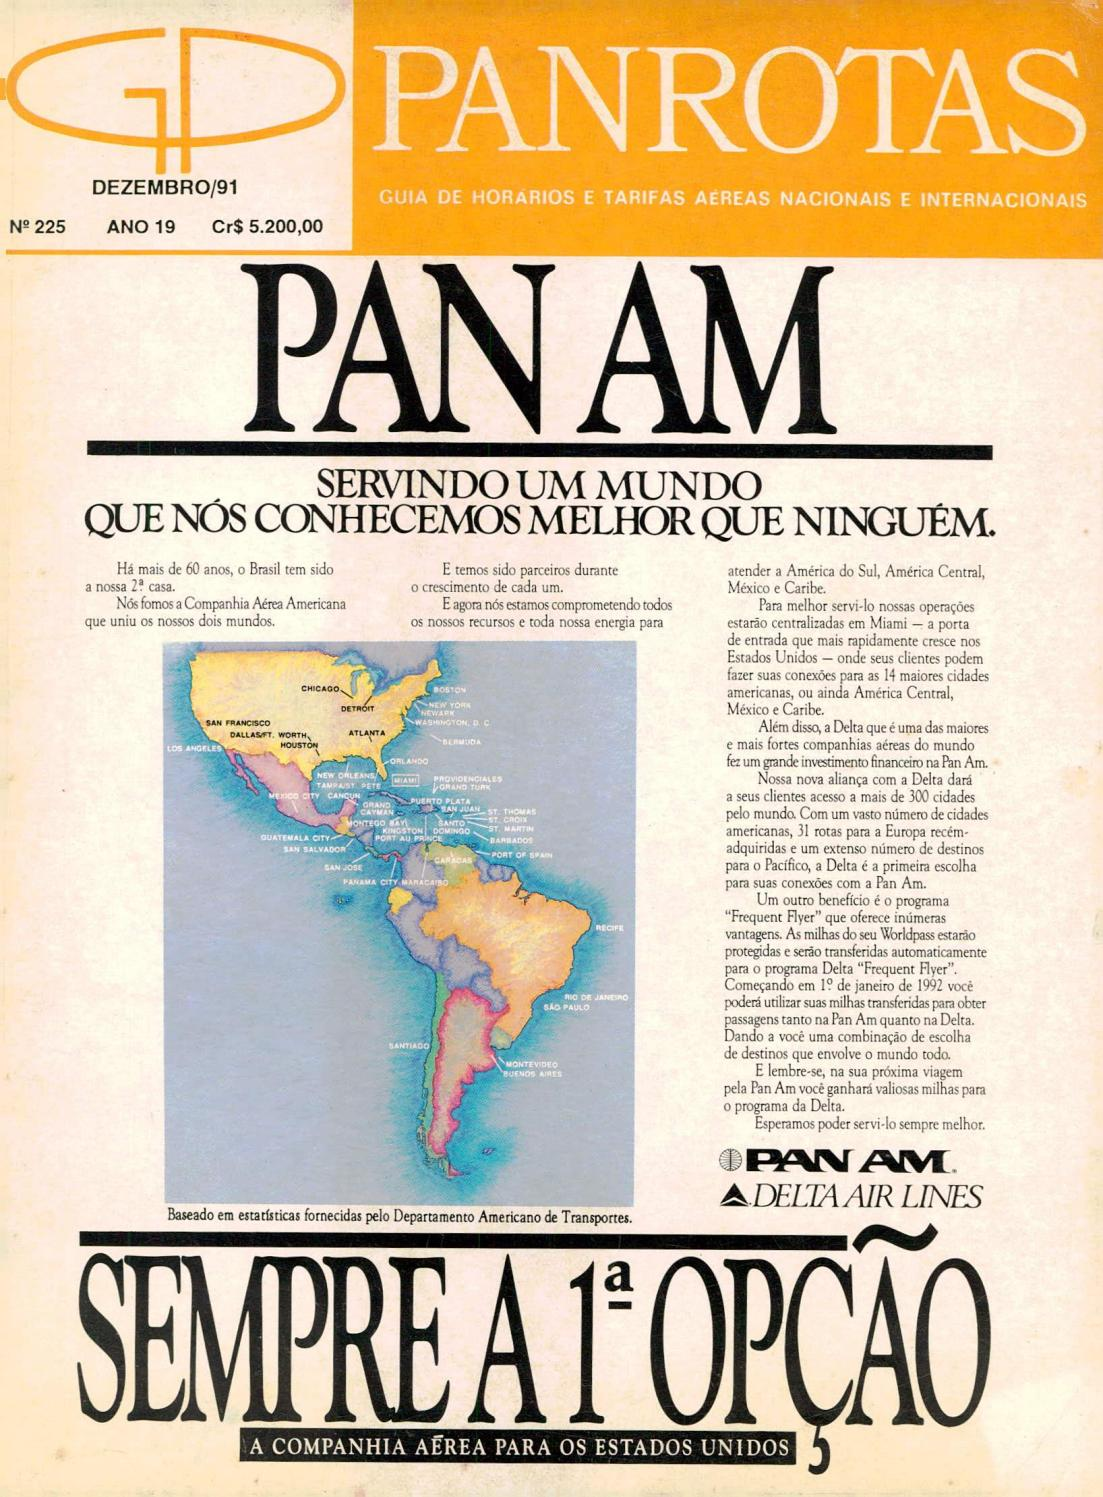 Guia panrotas edio 225 dezembro1991 by panrotas editora issuu fandeluxe Images